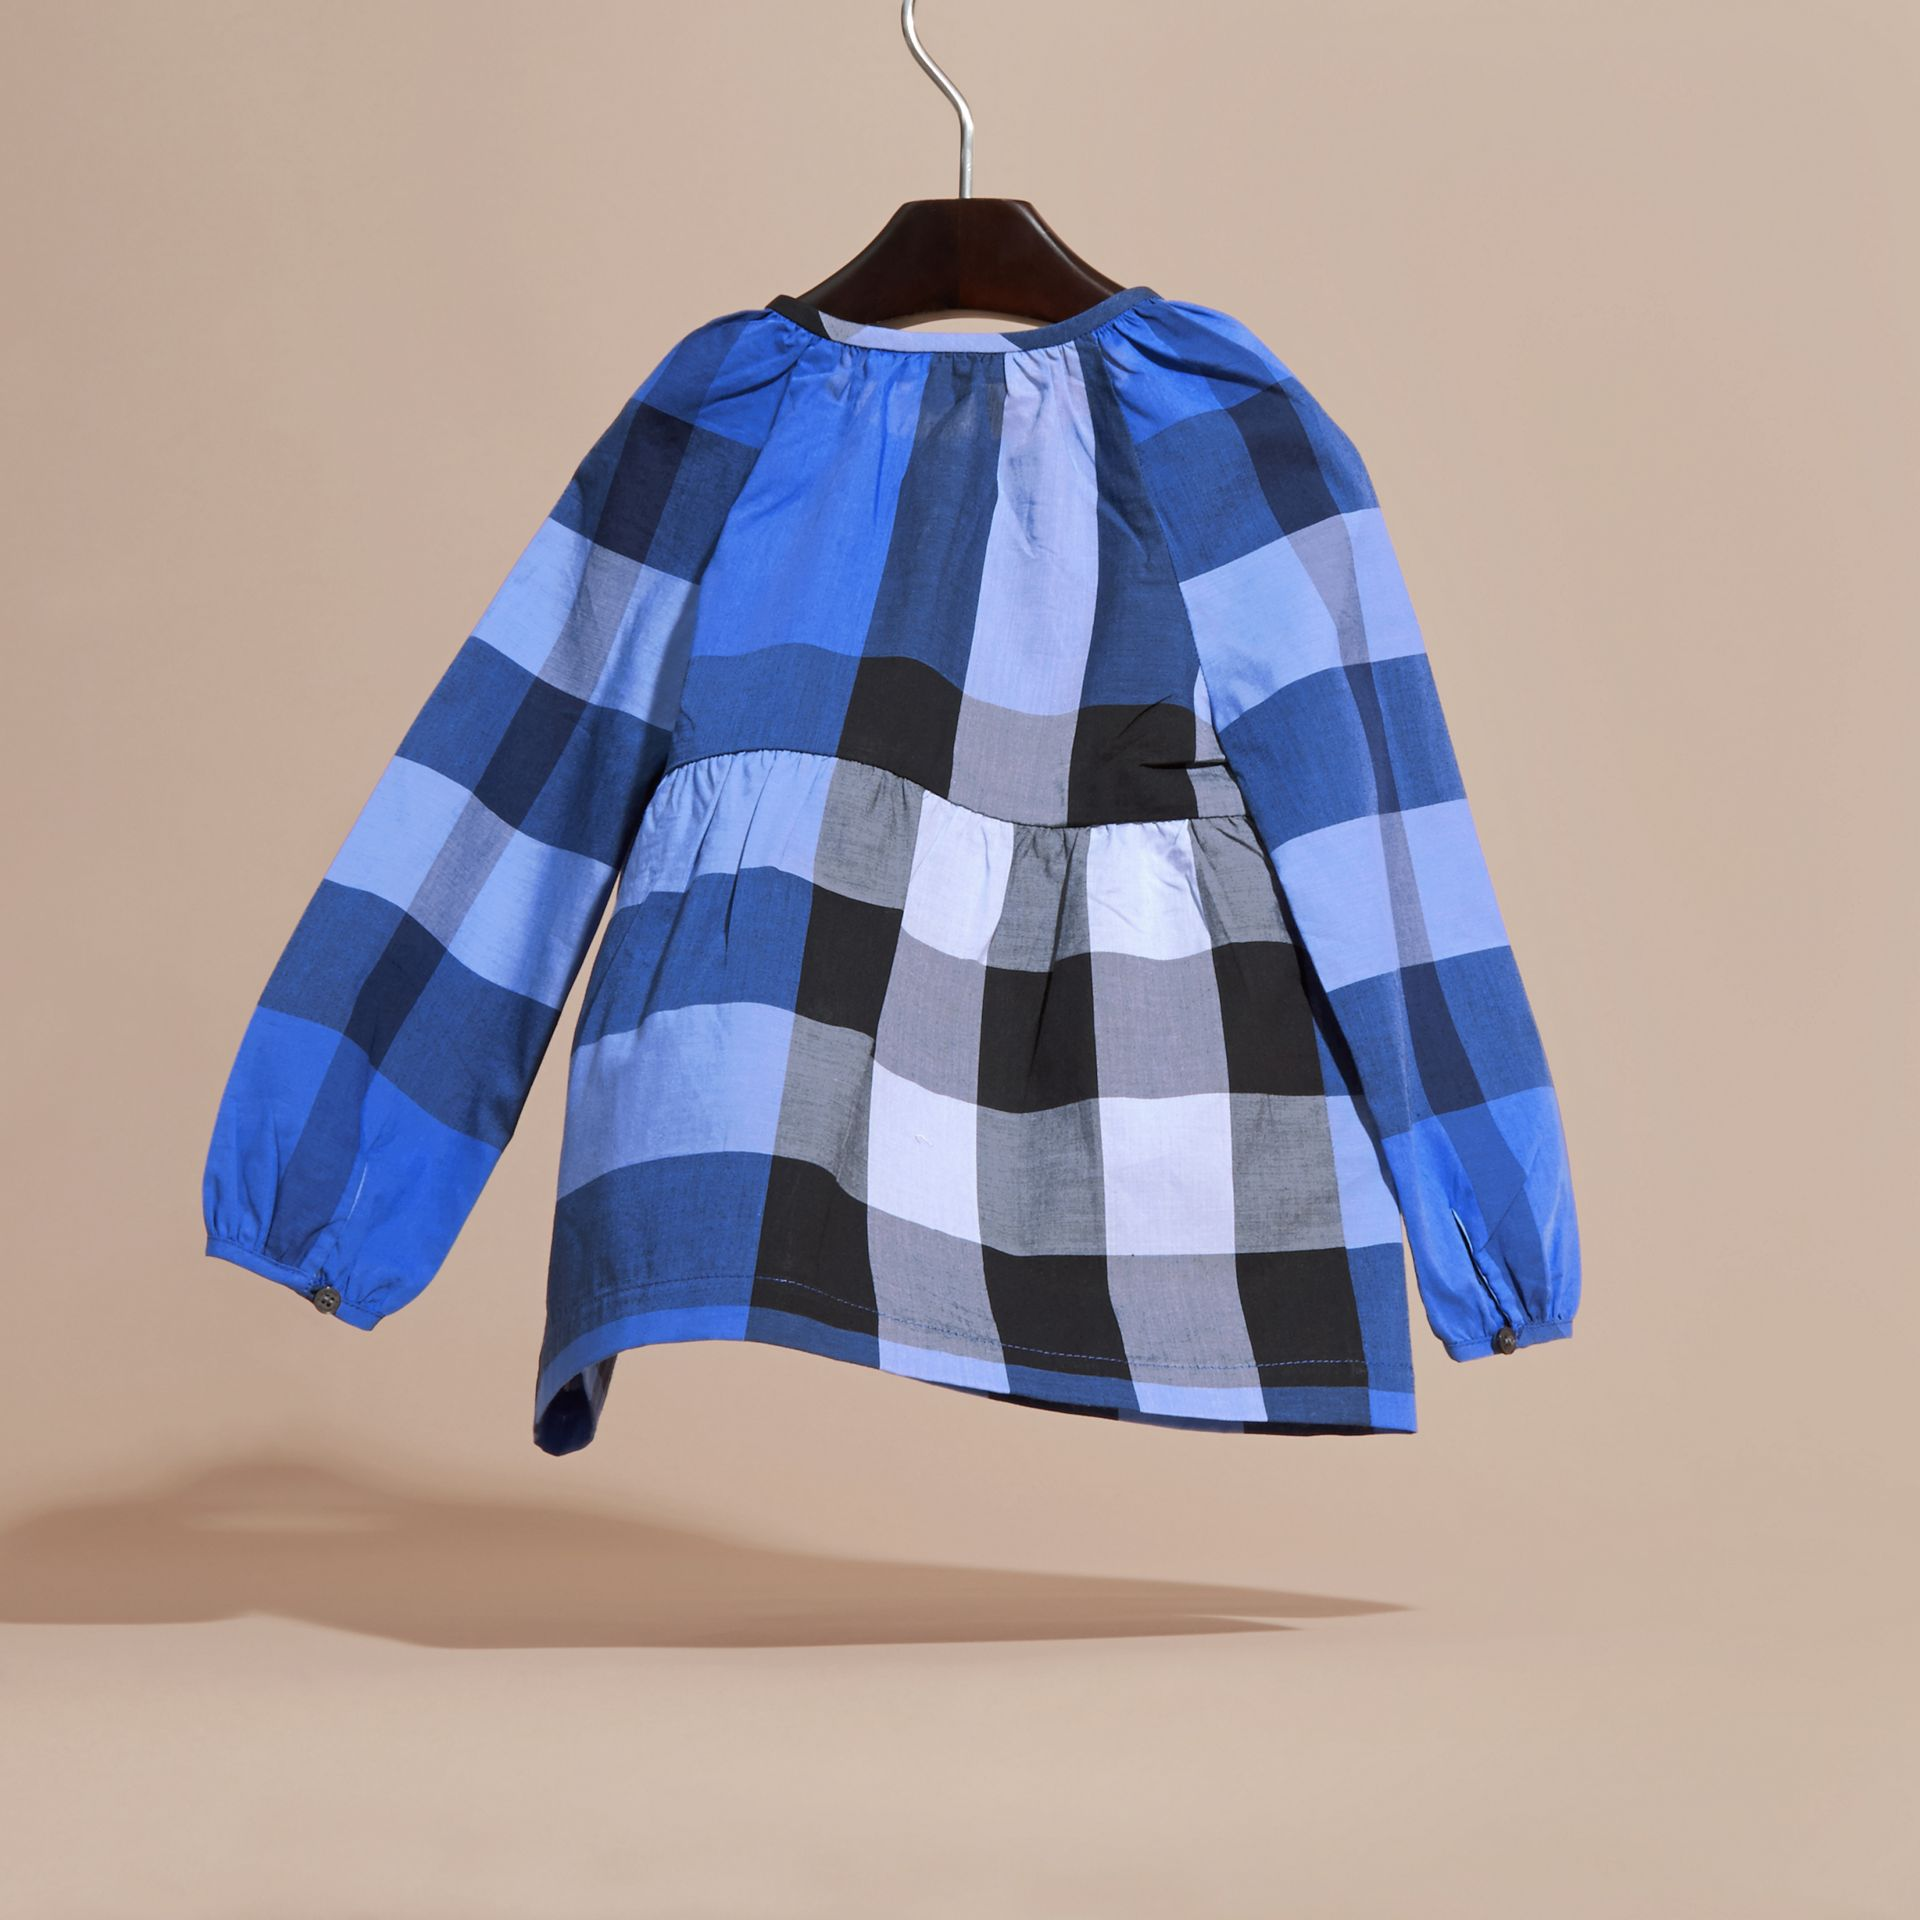 Bright hydrangea blue Puff Sleeve Check Cotton Blouse Bright Hydrangea Blue - gallery image 4